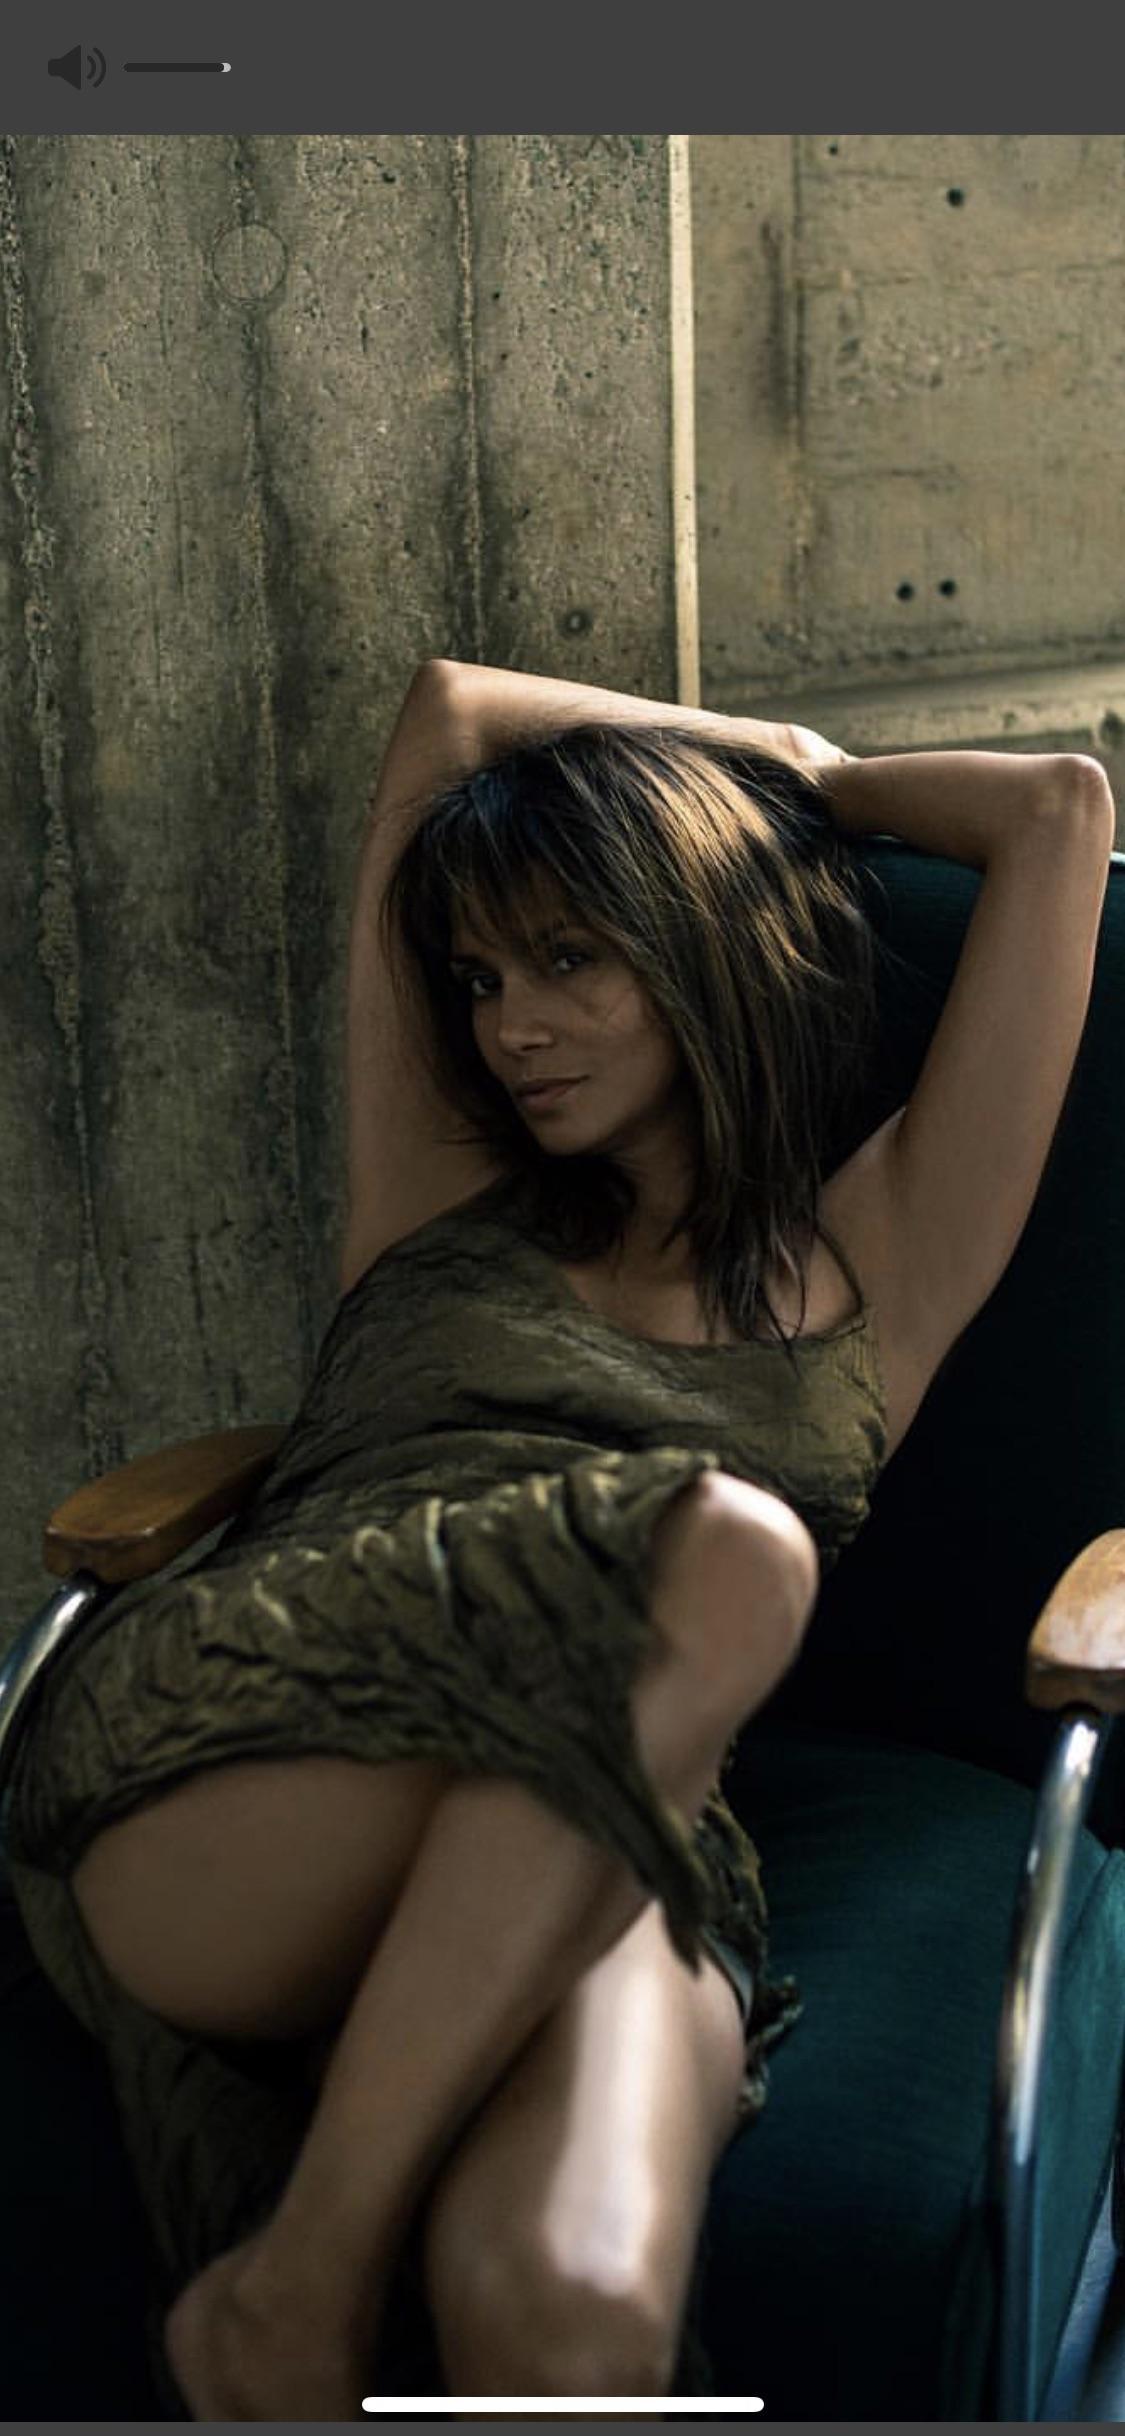 Halle Berry desnuda follando